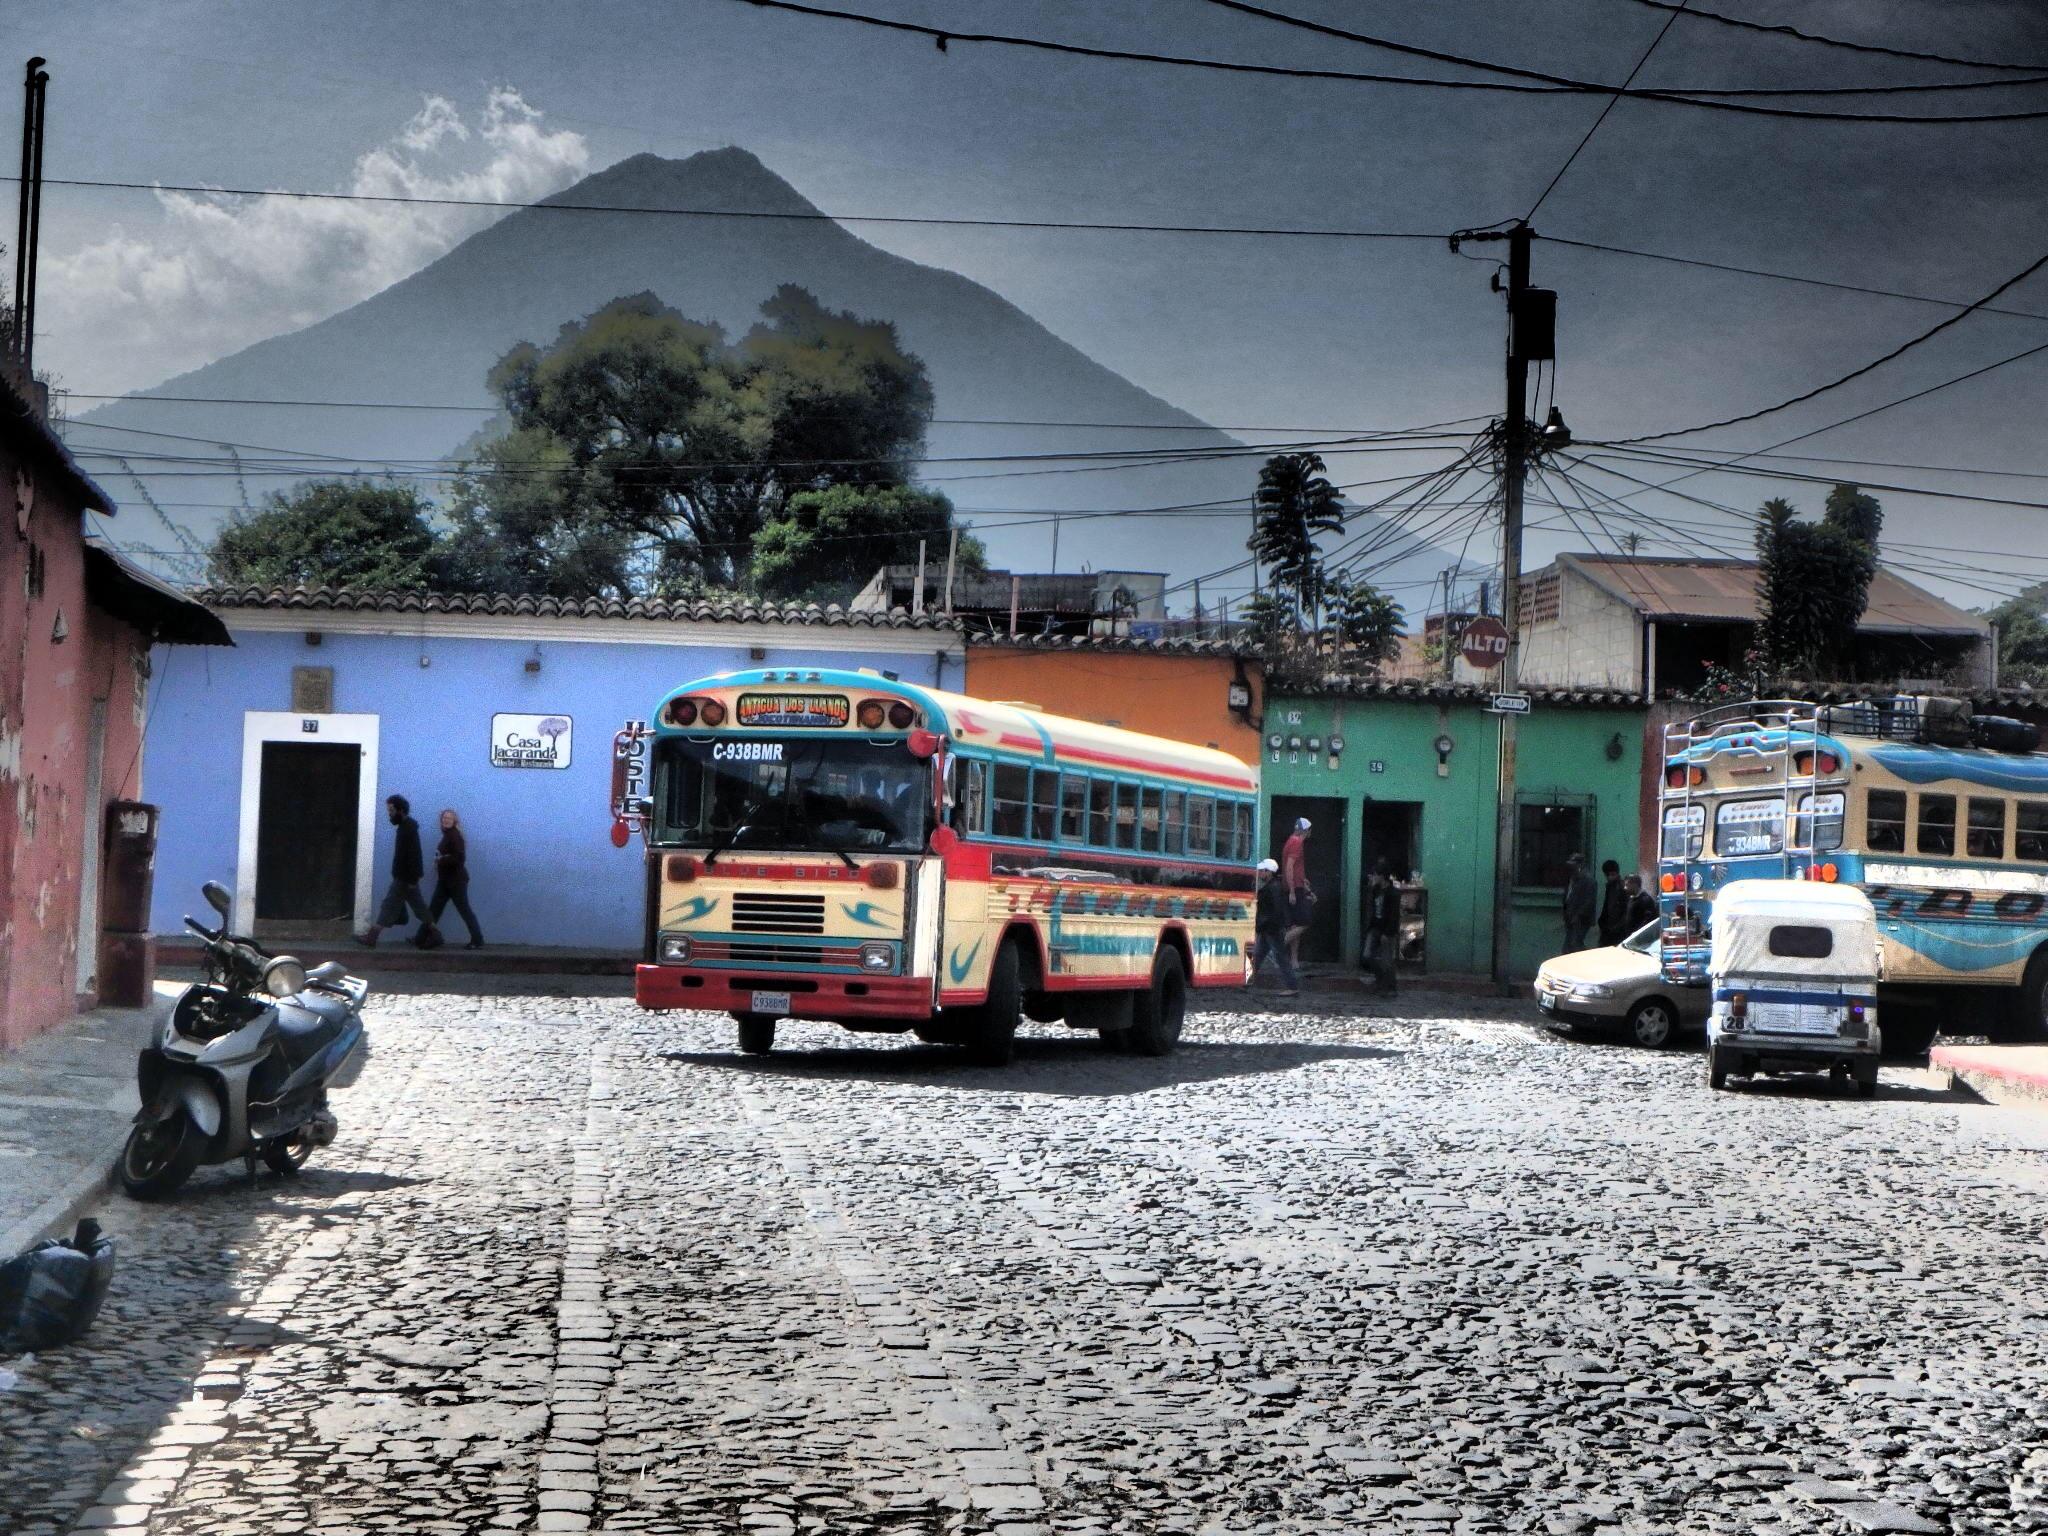 Guatemala_Antigua 4.JPG